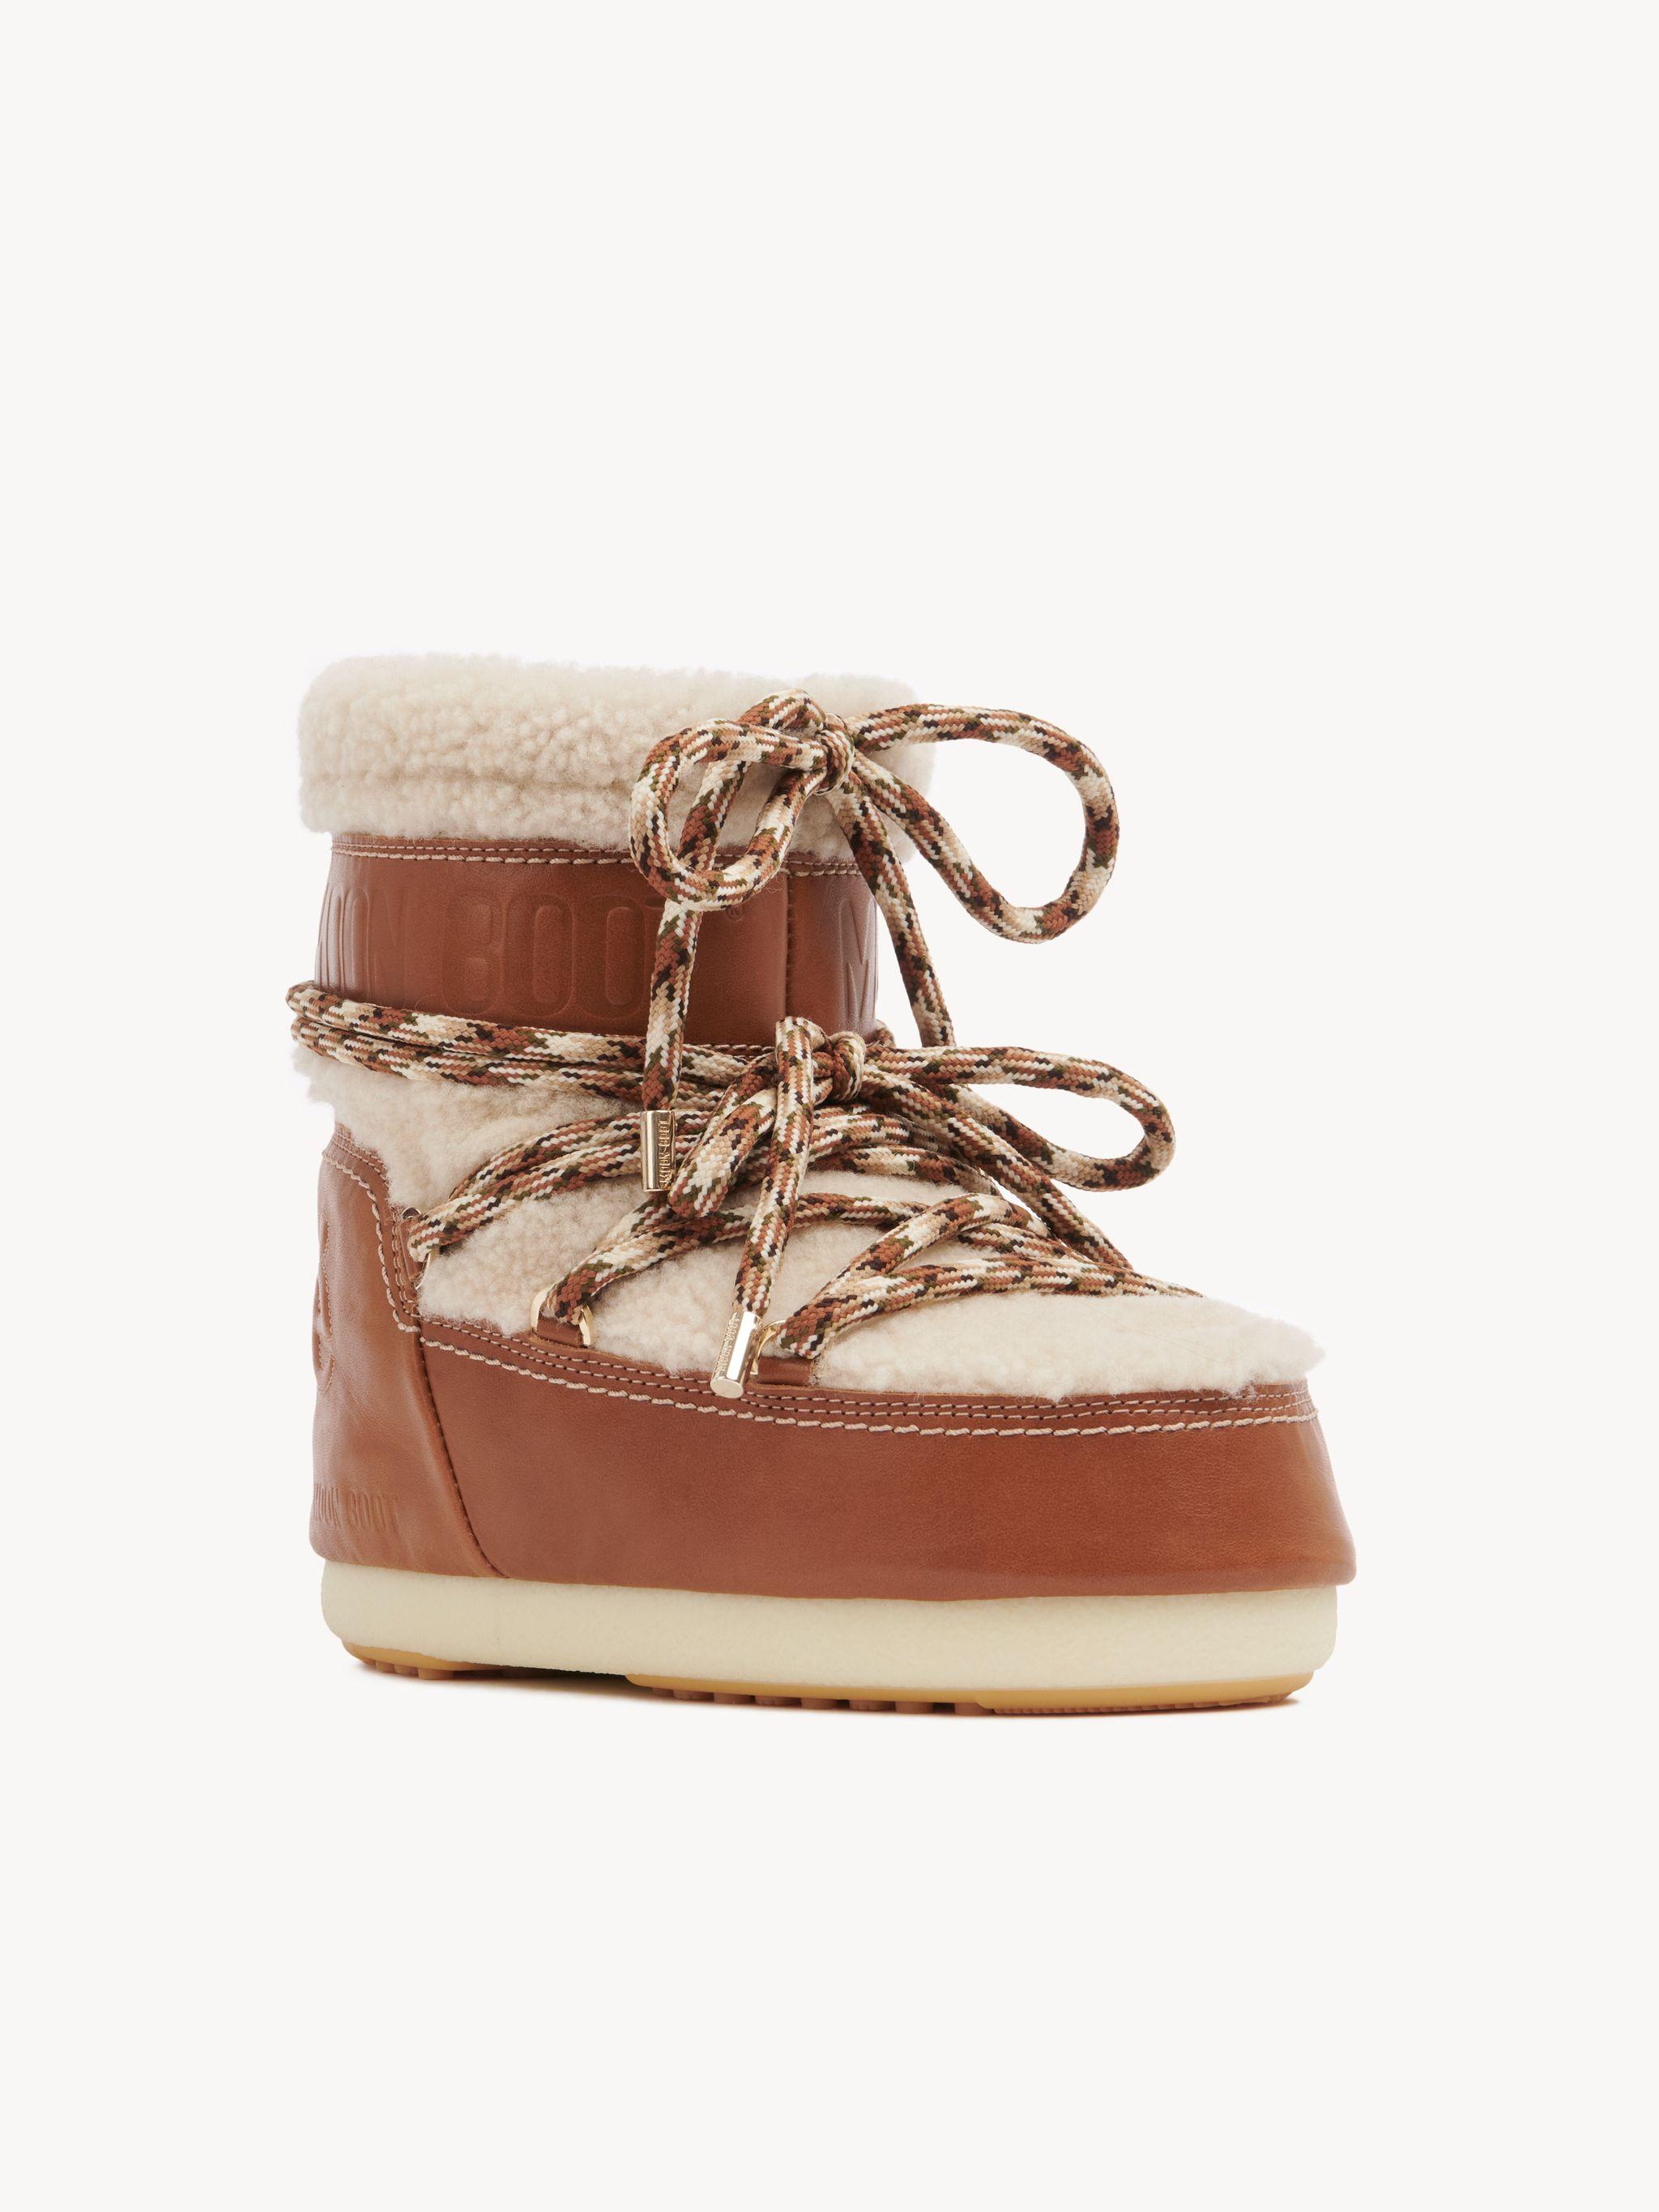 Ботинки Chloé Cream Shearling